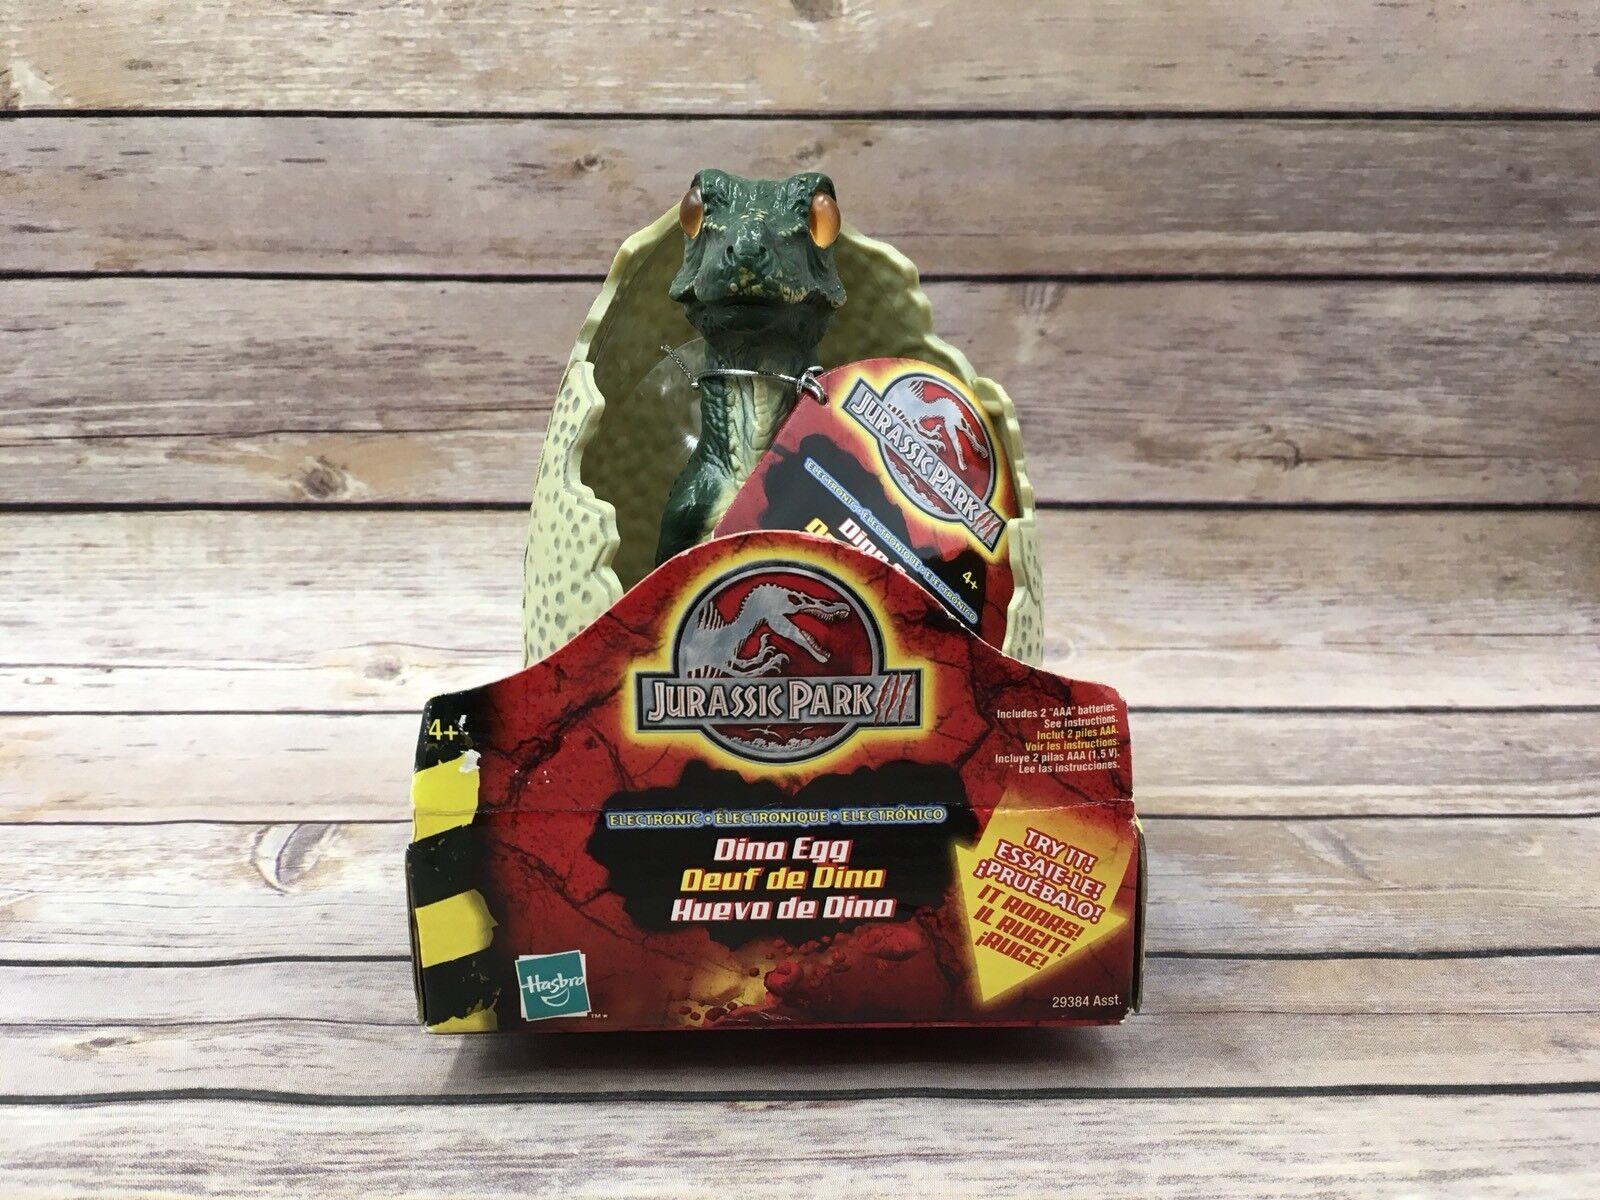 New Hasbro 2000 Jurassic Park III T-Rex Electronic Dino Egg  29387